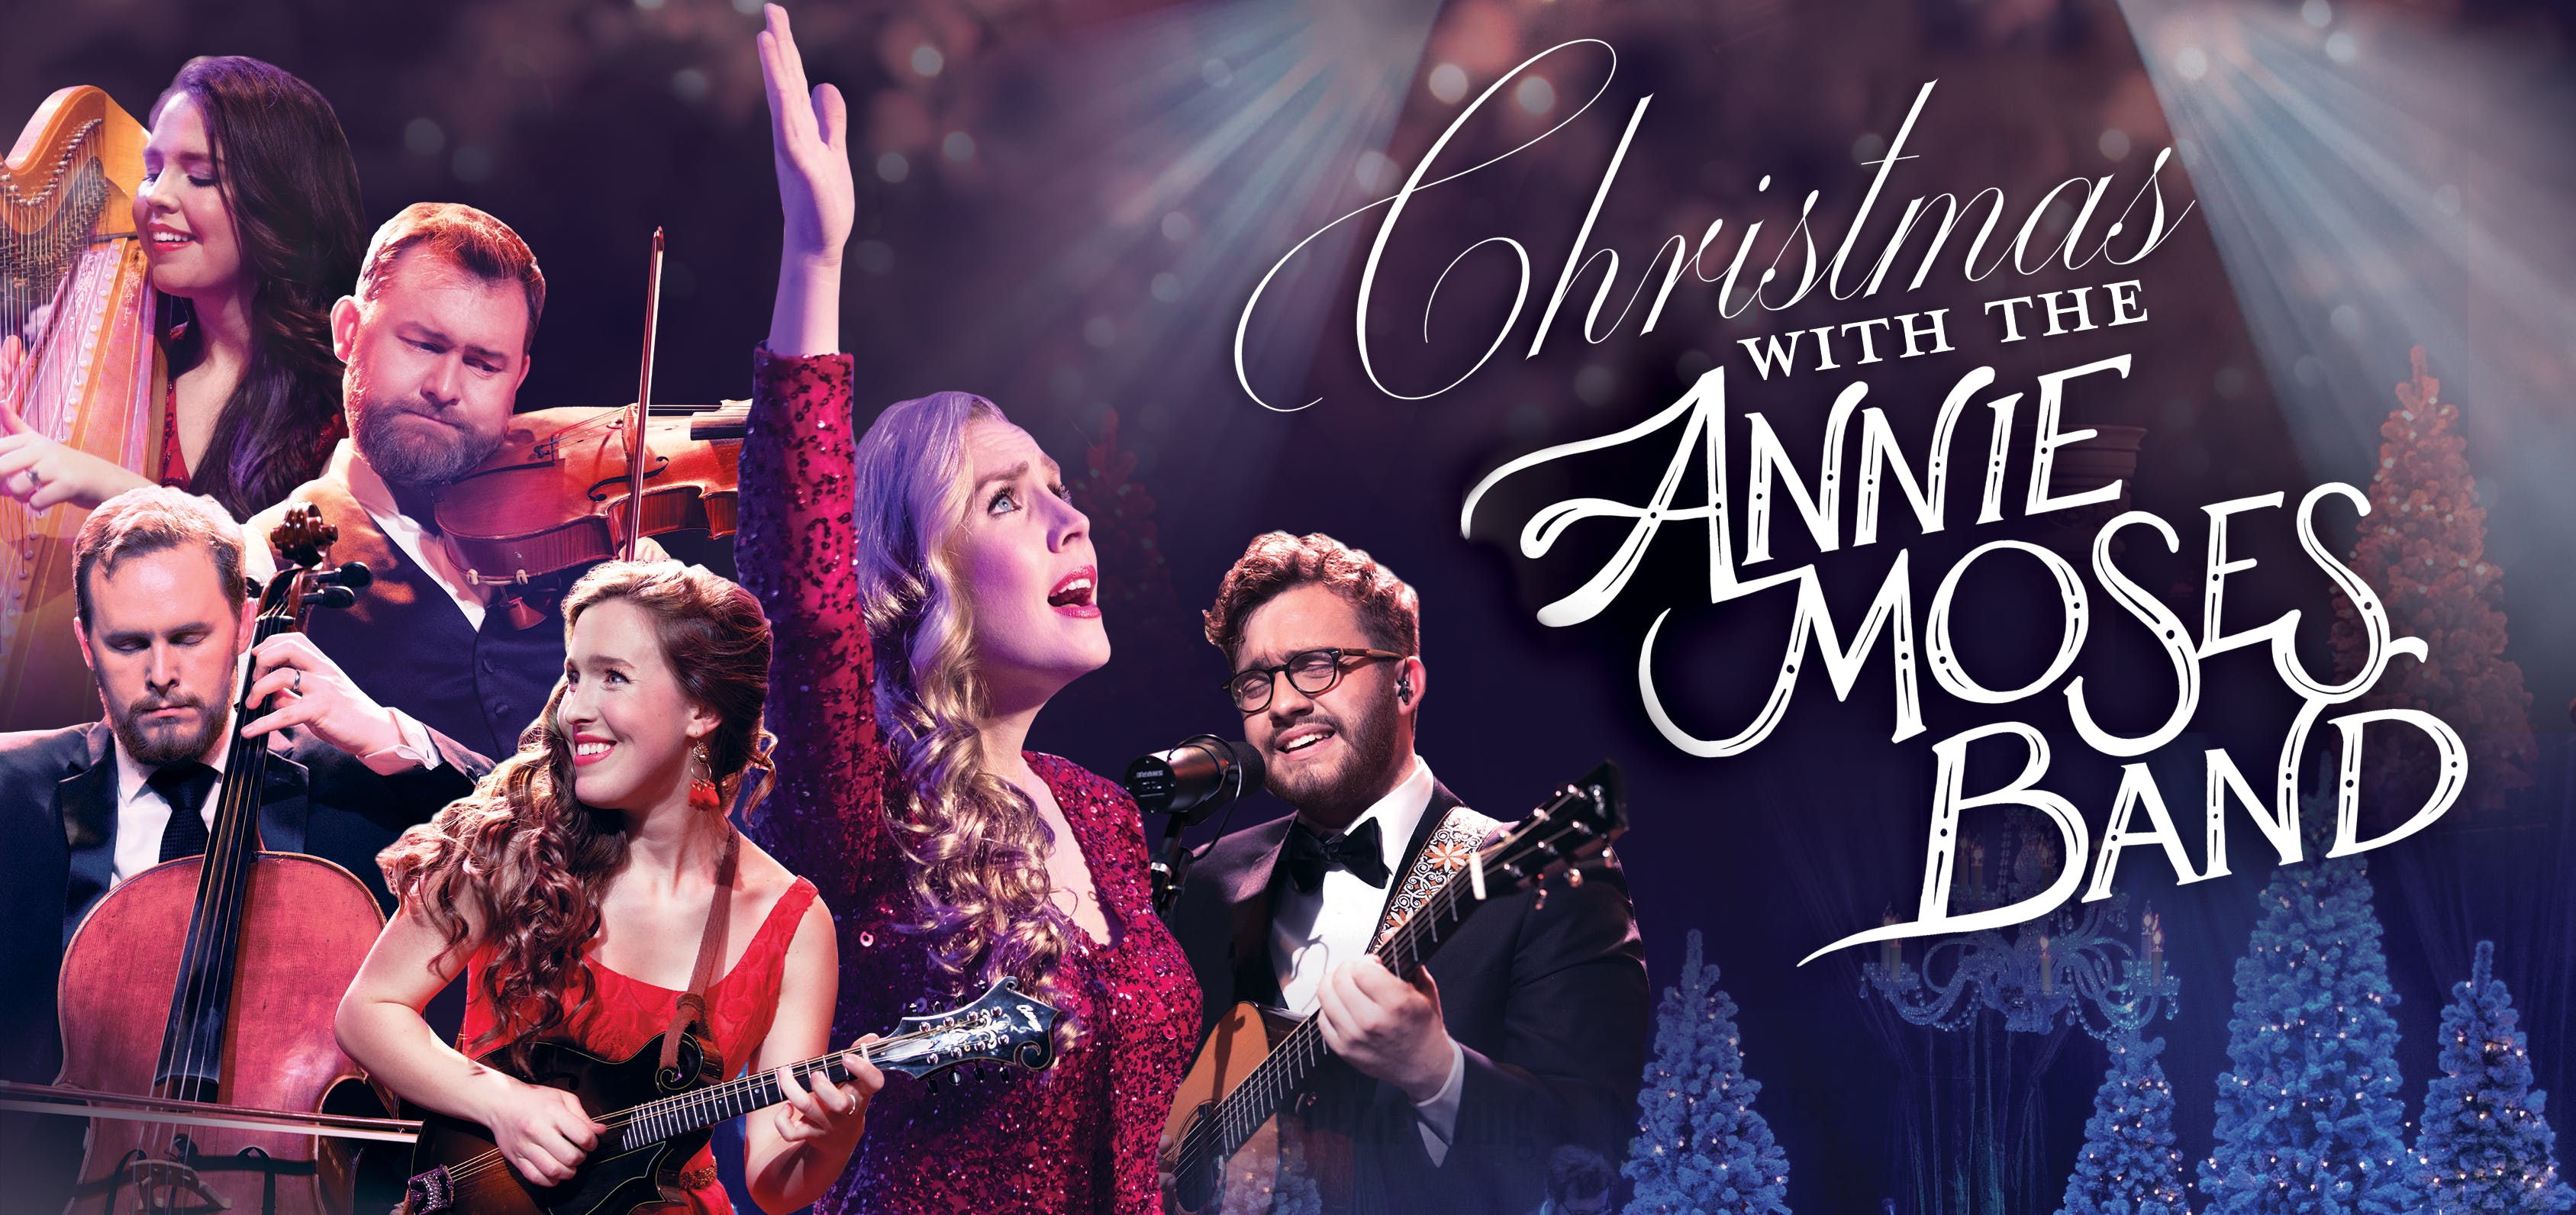 Annie Moses Band Christmas Concert - 9 DEC 2018